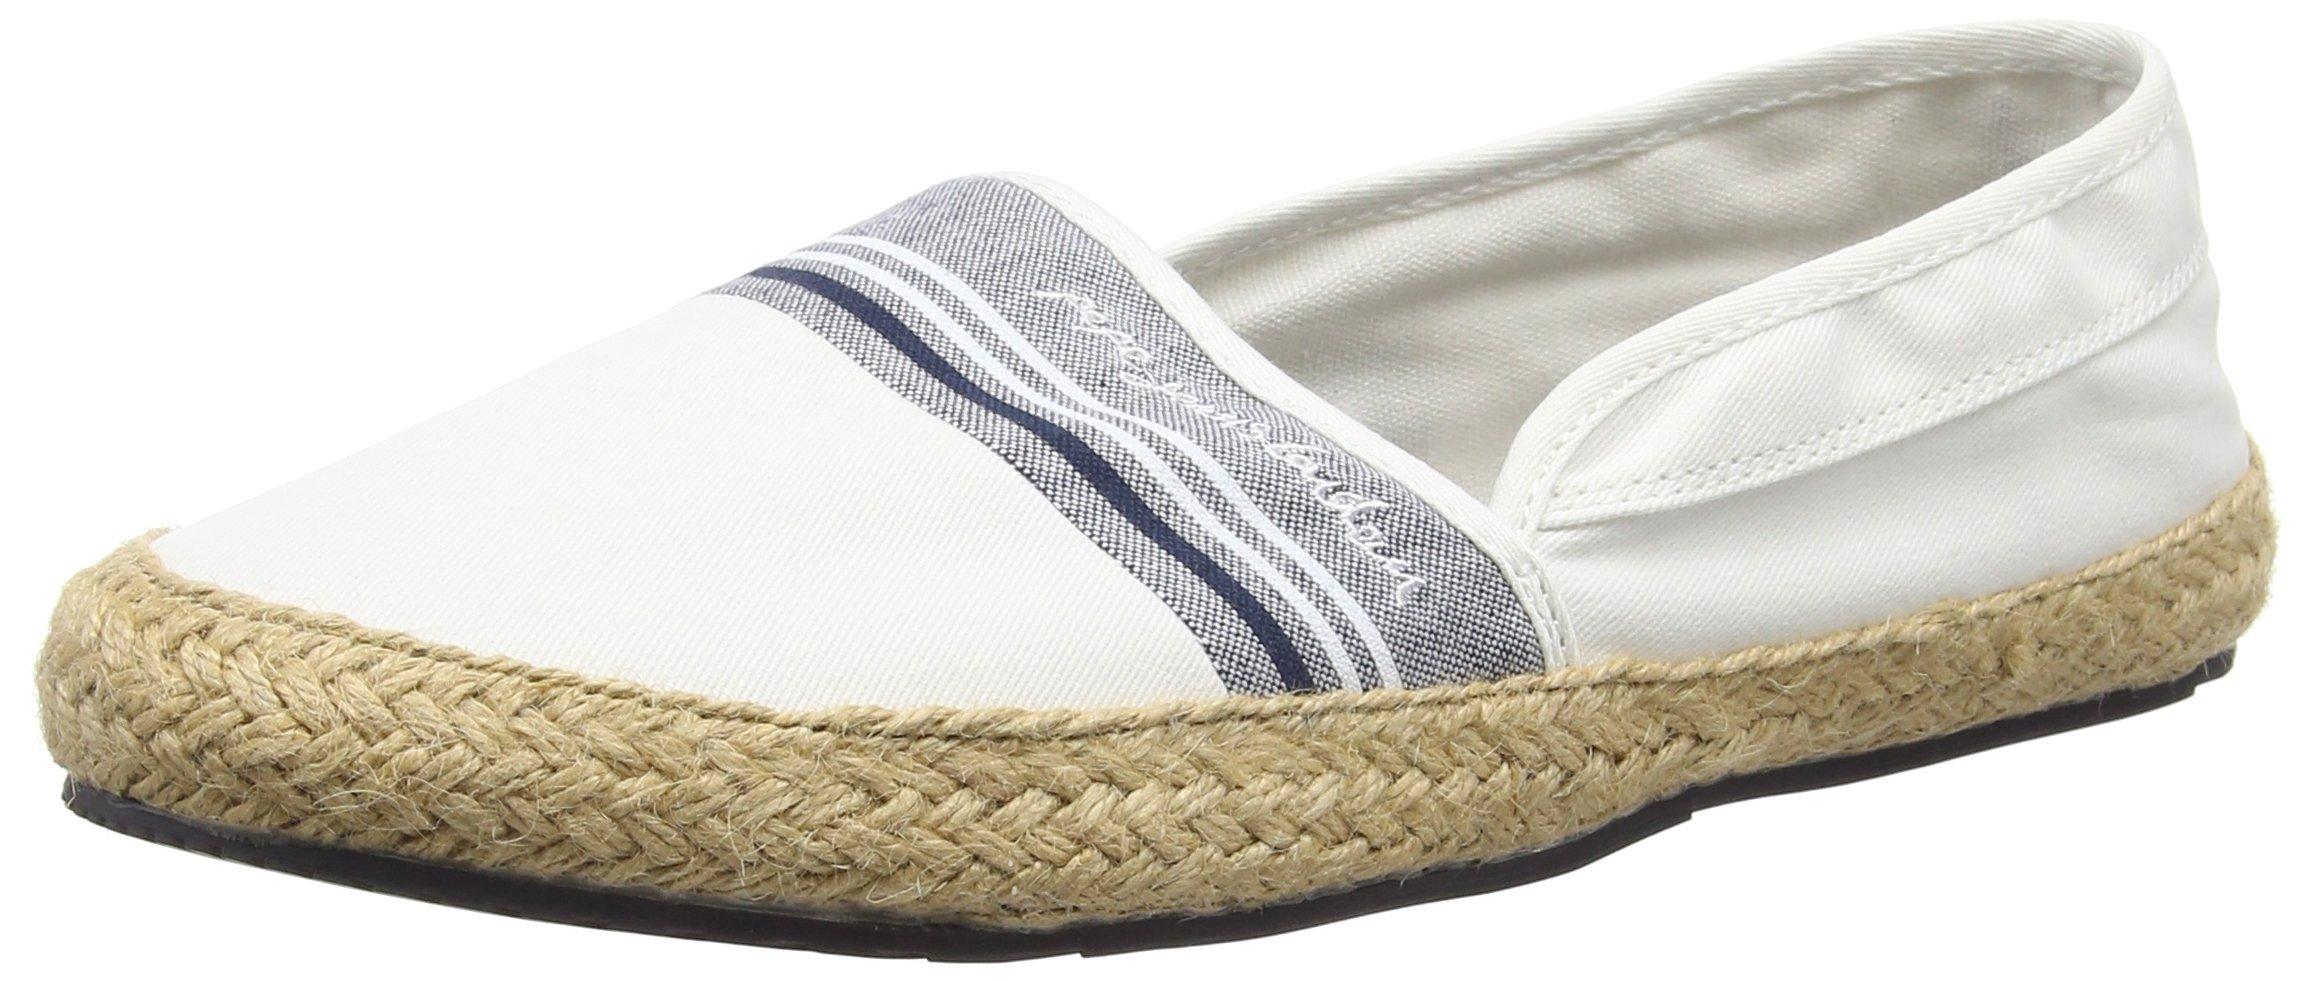 BasicEspadrilles Sail HommeBlanc Weiß800white43 Jeans Pepe n0wOk8P